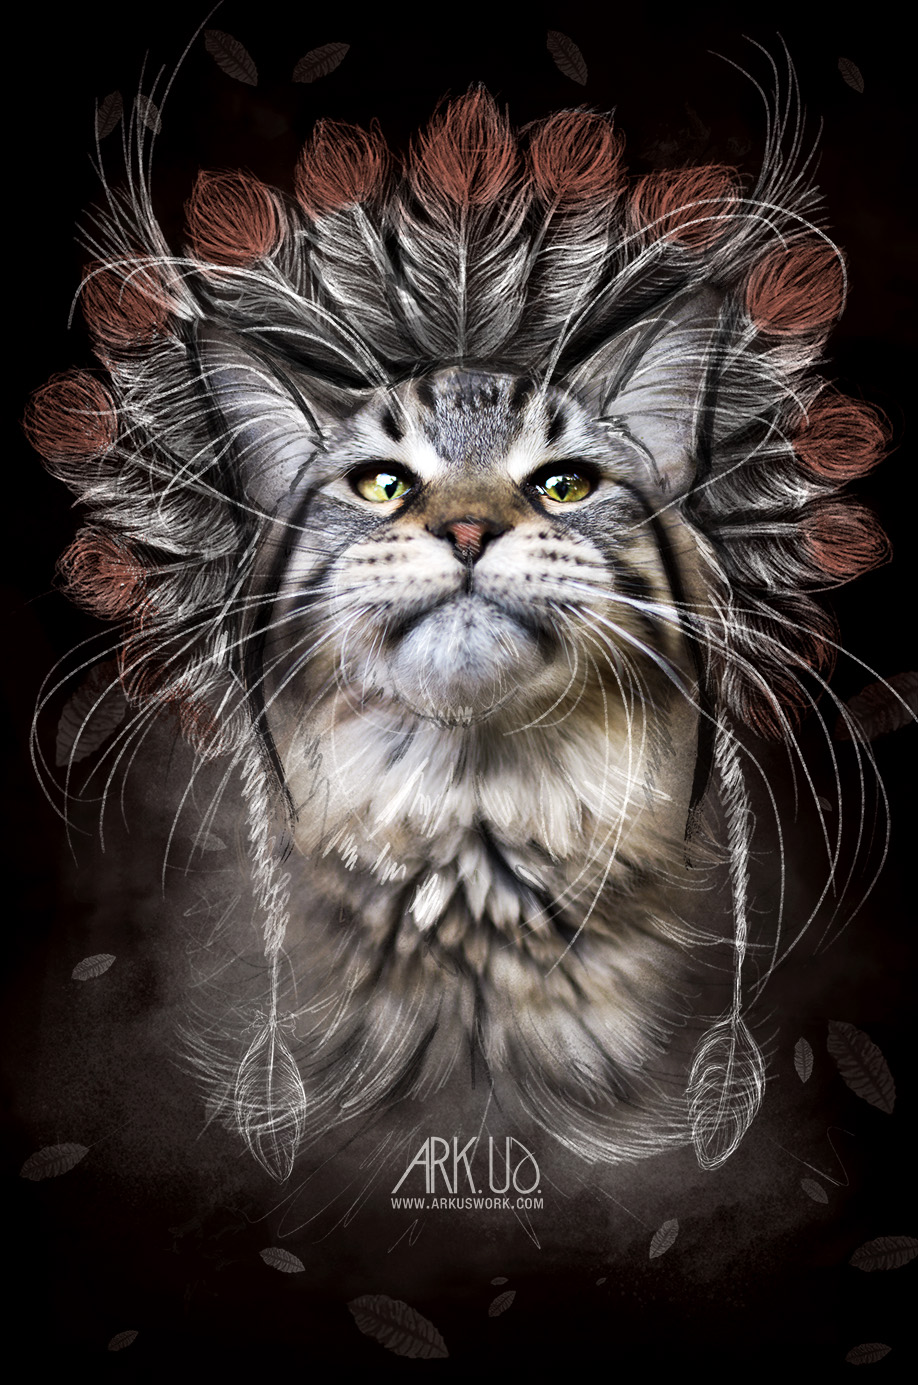 chat,totem,indien,amerindien,plume,rouge,felin,animal,compagnie,maine coon,digital,art,artwork,dessin,numerique,photoshop,photo,photographie